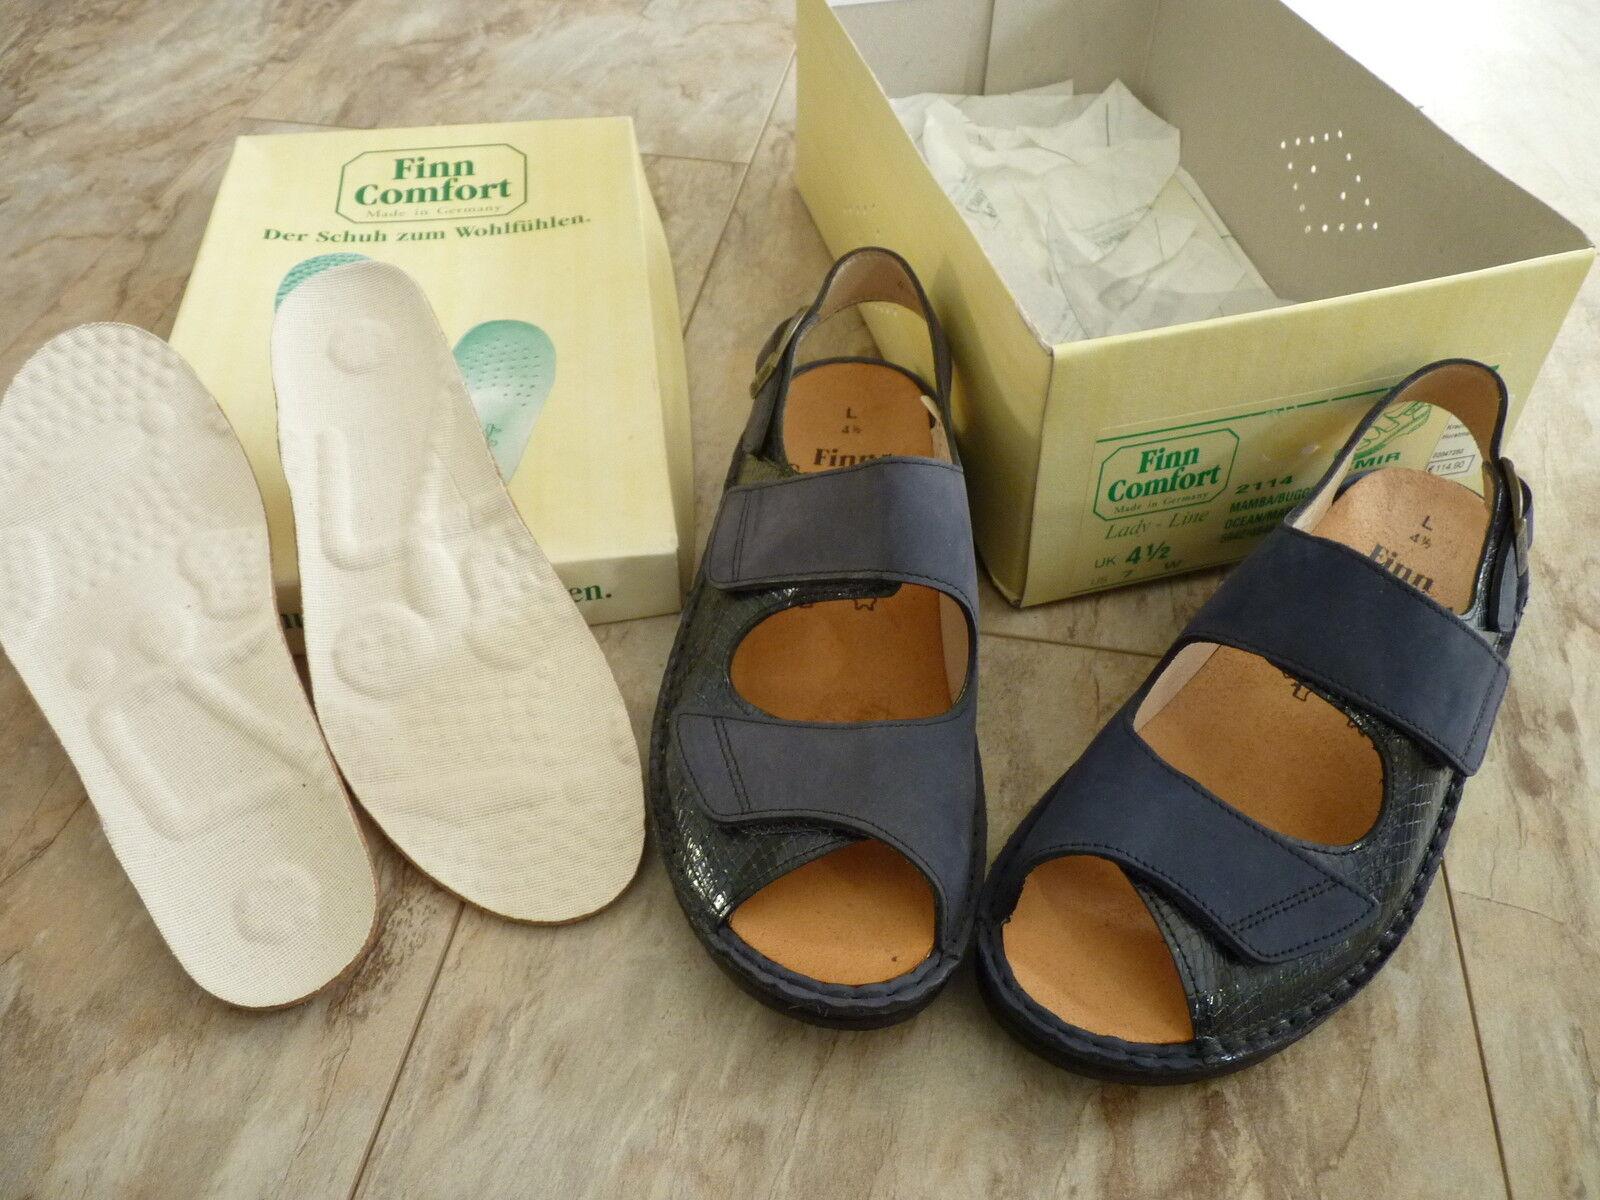 FINN COMFORT Izmir Damen Sommer Schuhe Sandalen 37,5 Klett Einlagen Gr.4,5 / 37,5 Sandalen NEU 1038ed